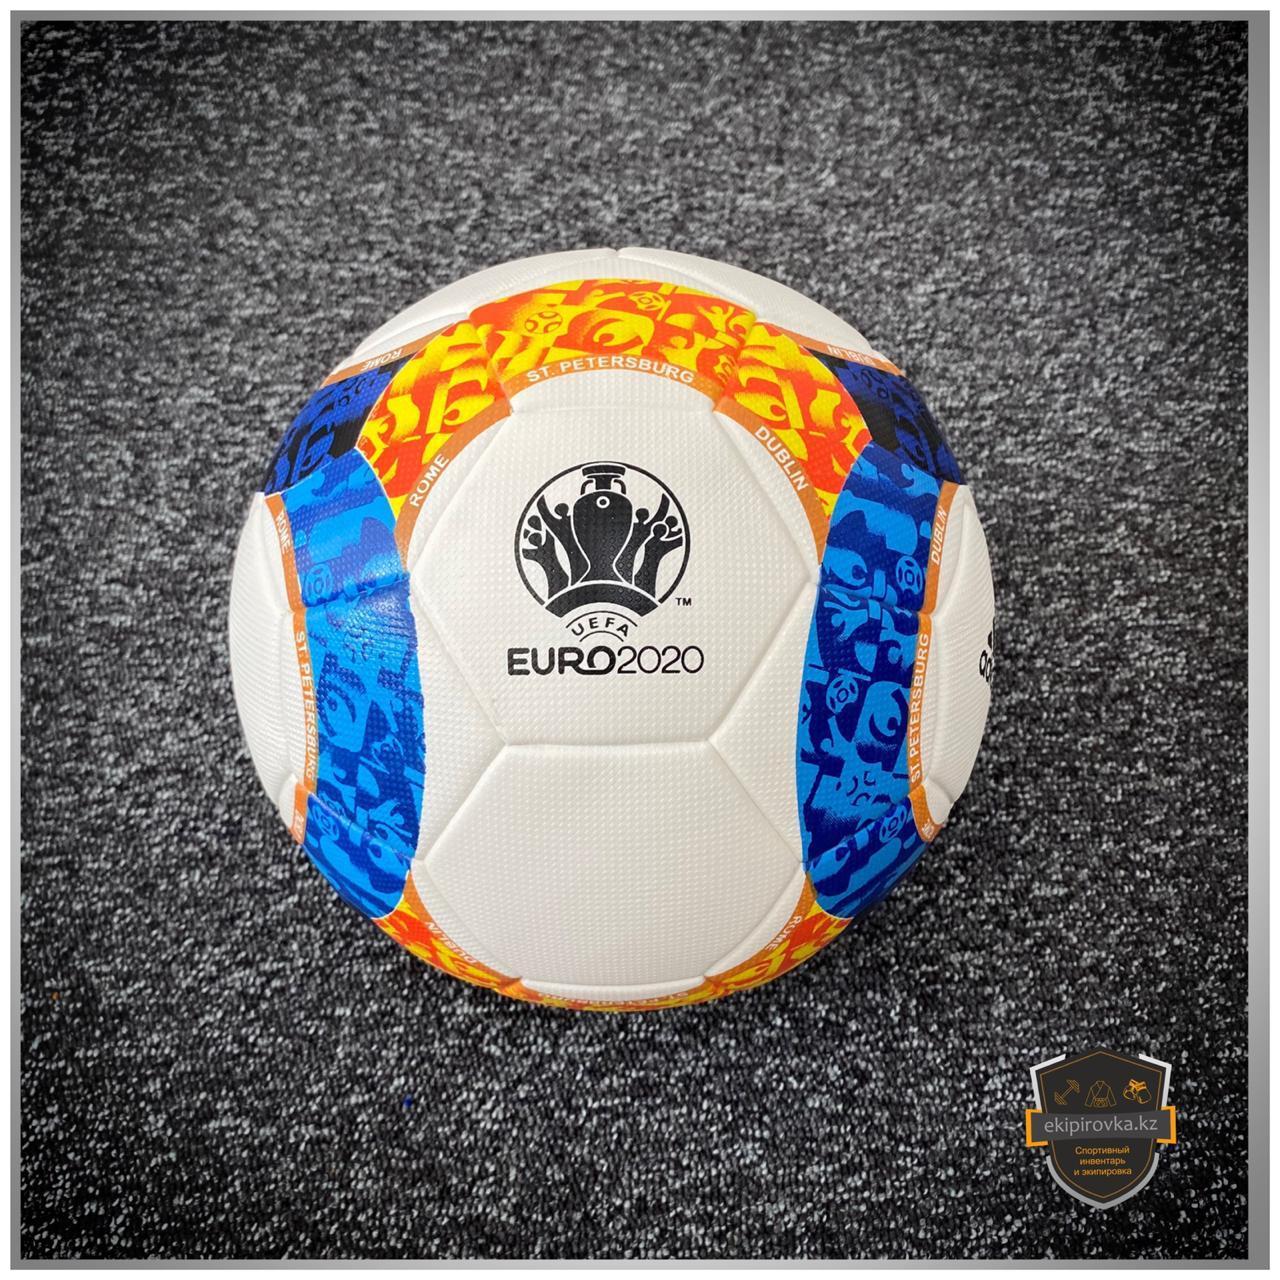 Мяч Adidas euro 2020